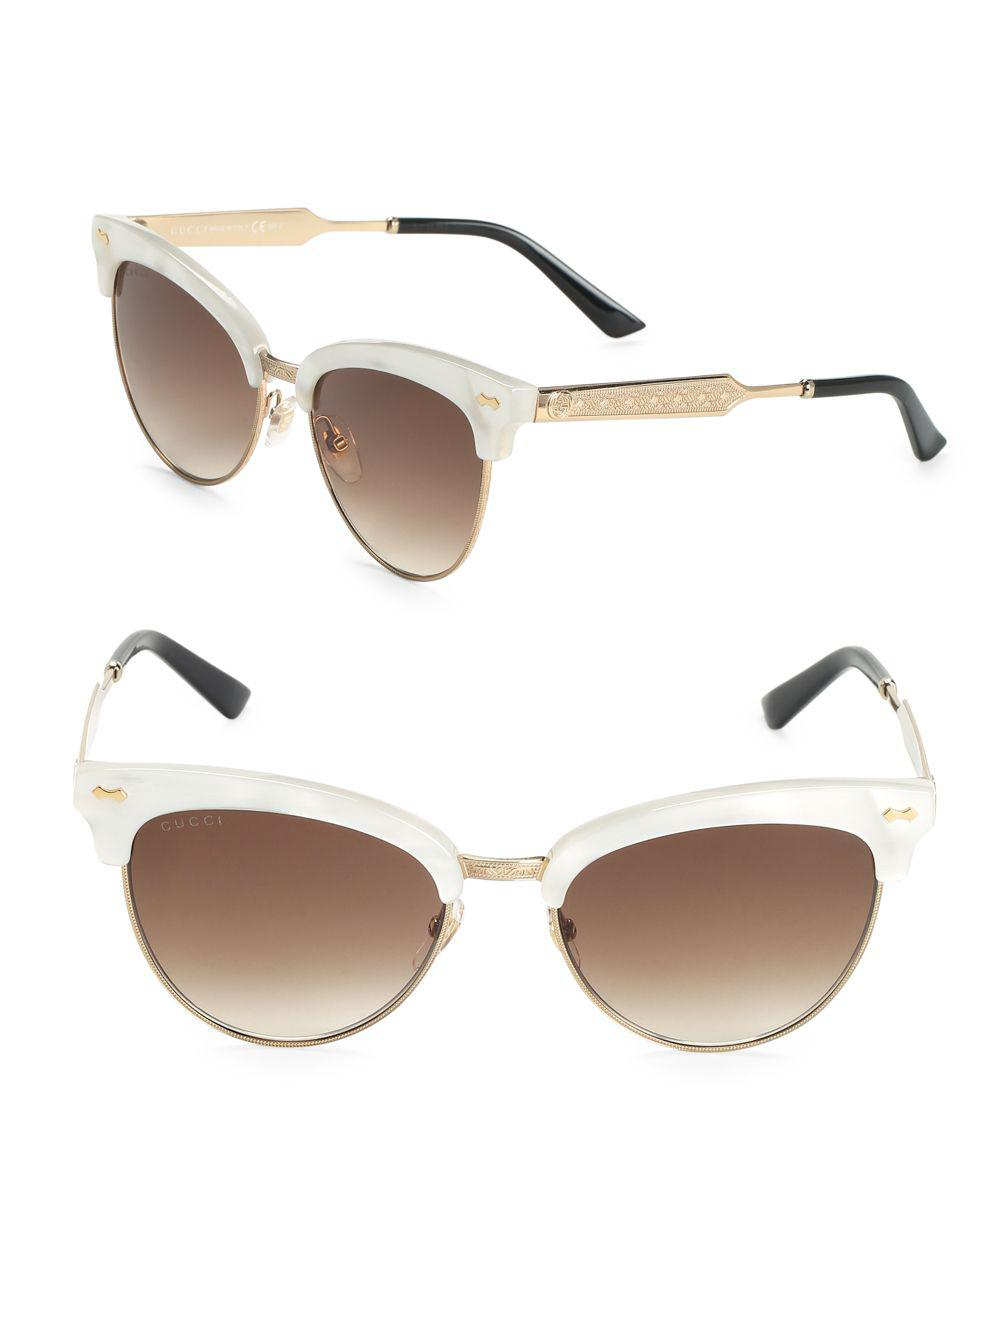 a61b8084058fd Gucci cat eye sunglasses mother of pearl